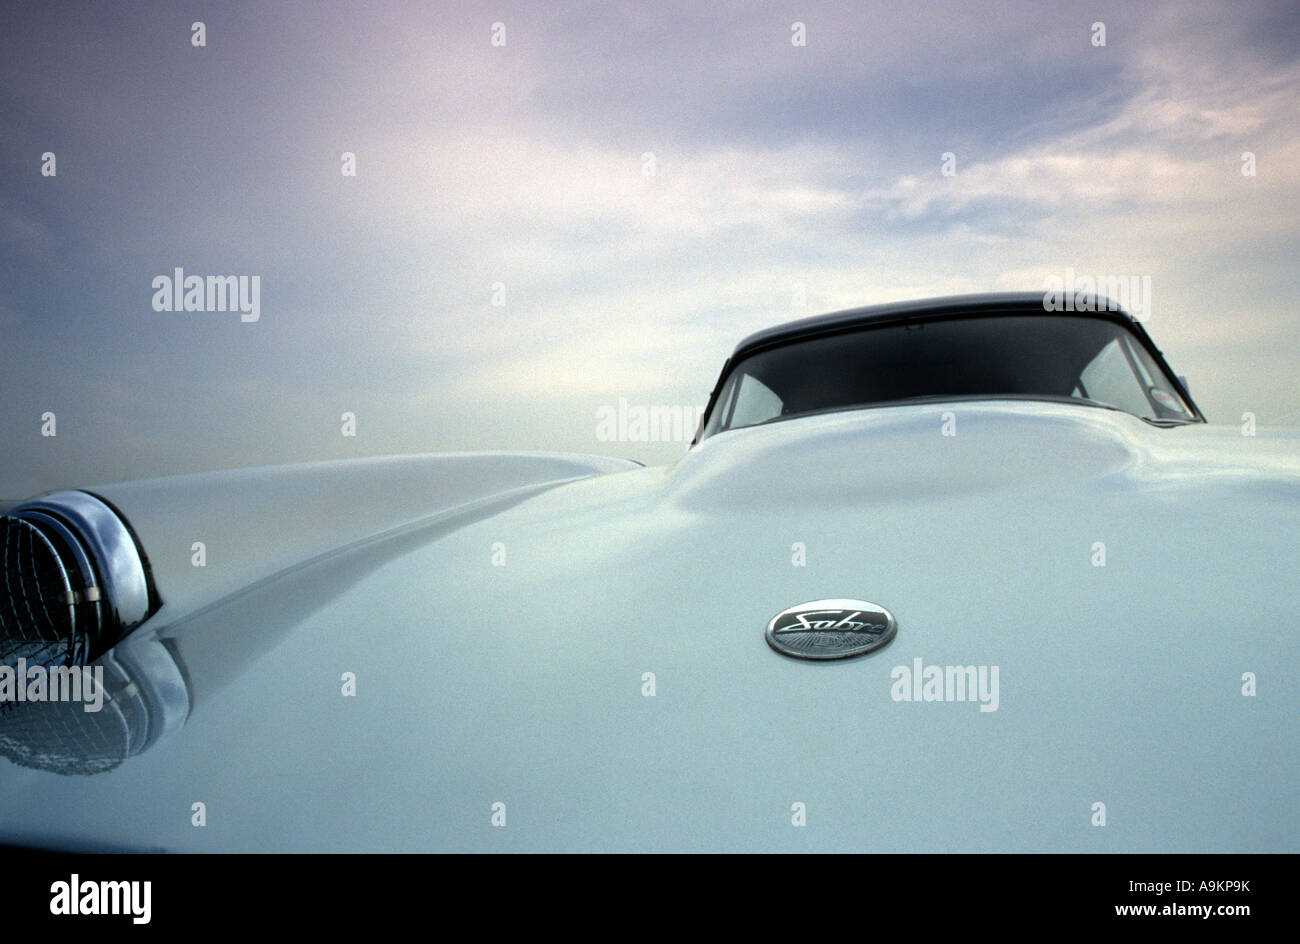 Reliant Sabre. Built 1961 to 1966. English car manufacturer 1934 on. Reliant auto badge marque British maker motif - Stock Image